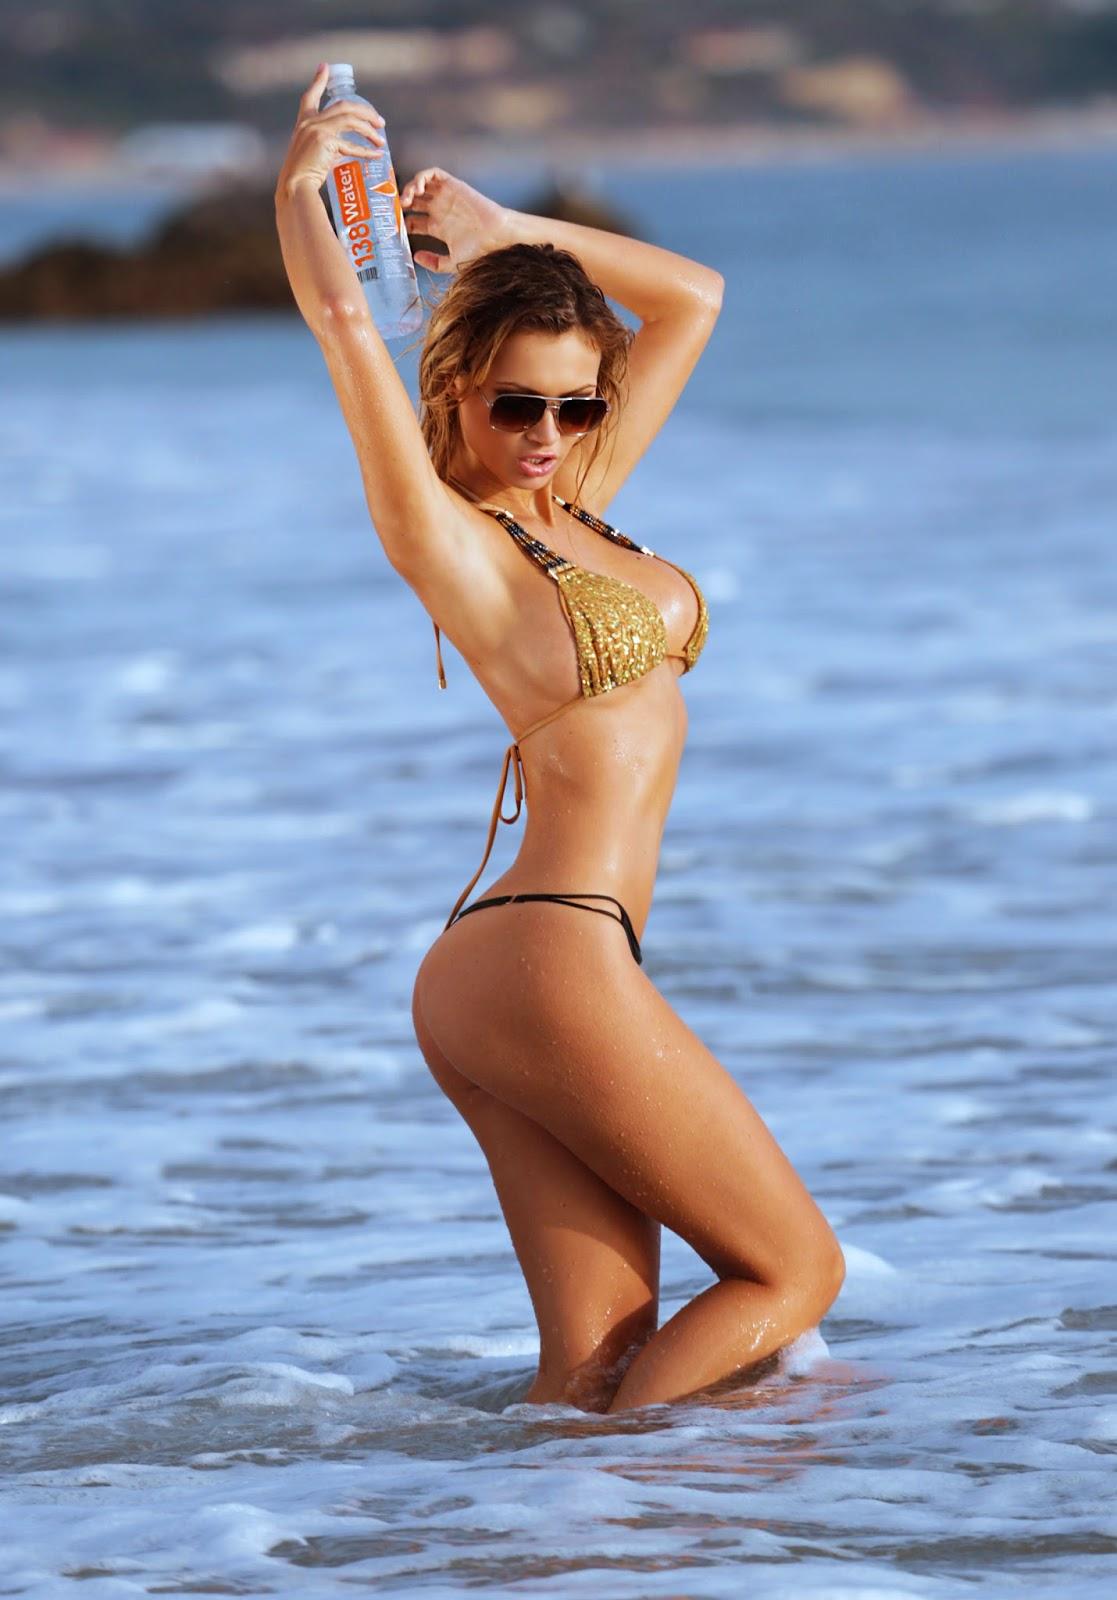 Carla giraldo nude - 2019 year